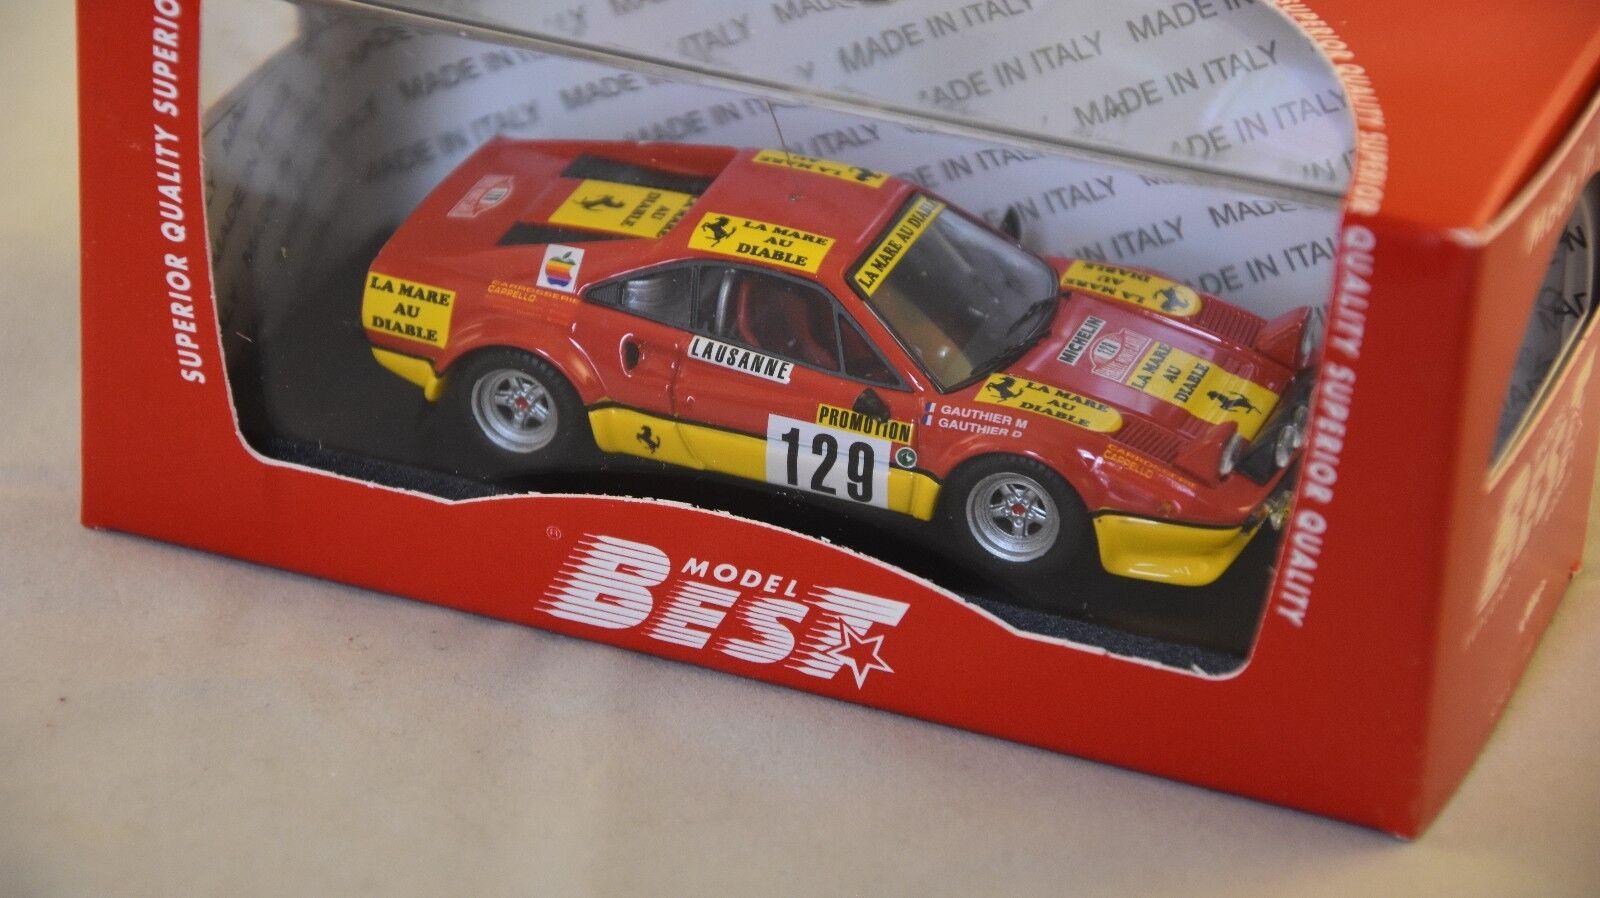 BEST modello BES9620 - Ferrari 308 GTB Gr.4 rtuttiye Monte autolo - 1983    1 43